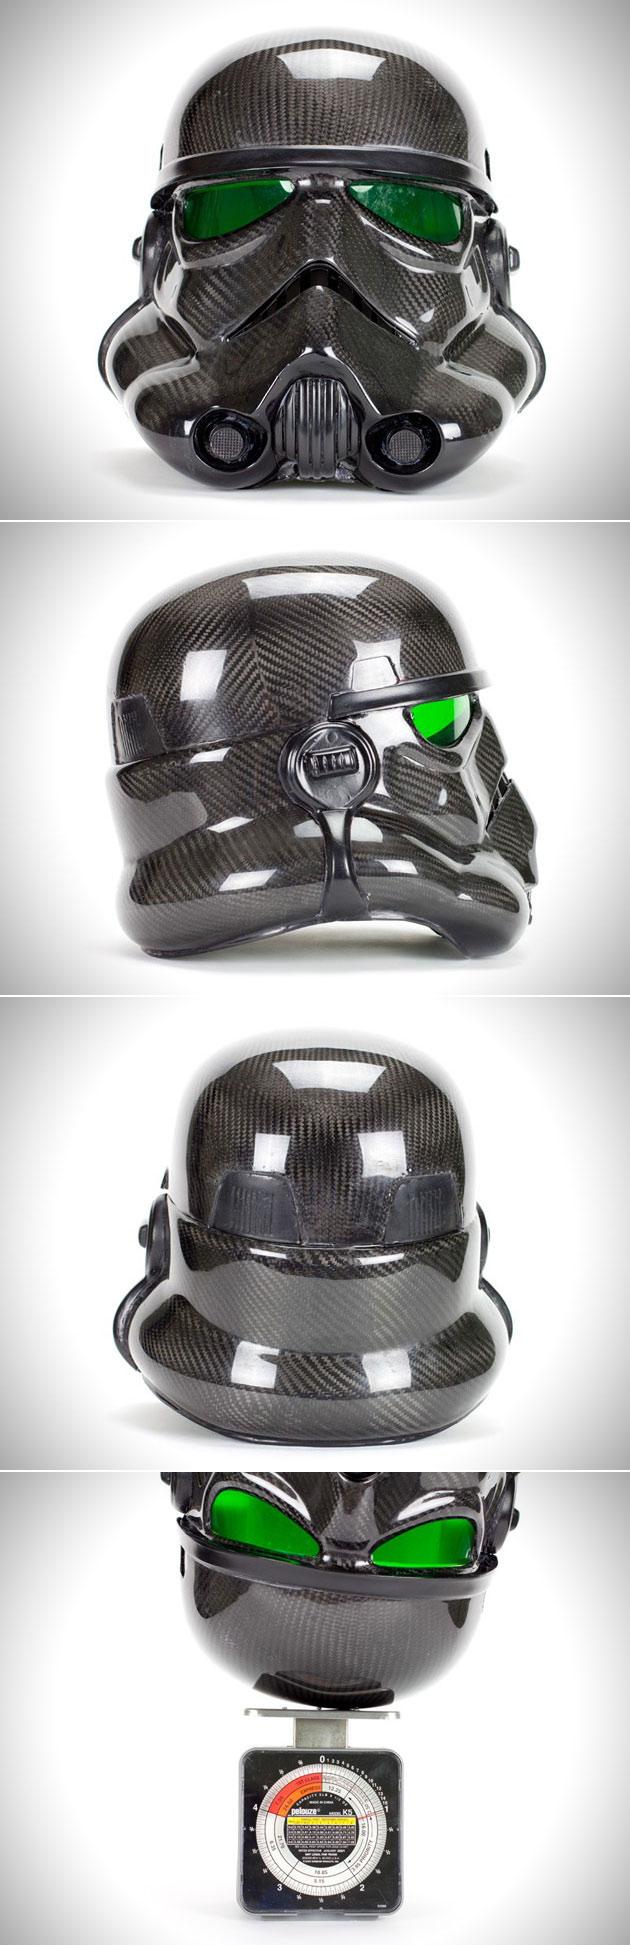 Star Wars Stormtrooper Carbon Fiber Helmet